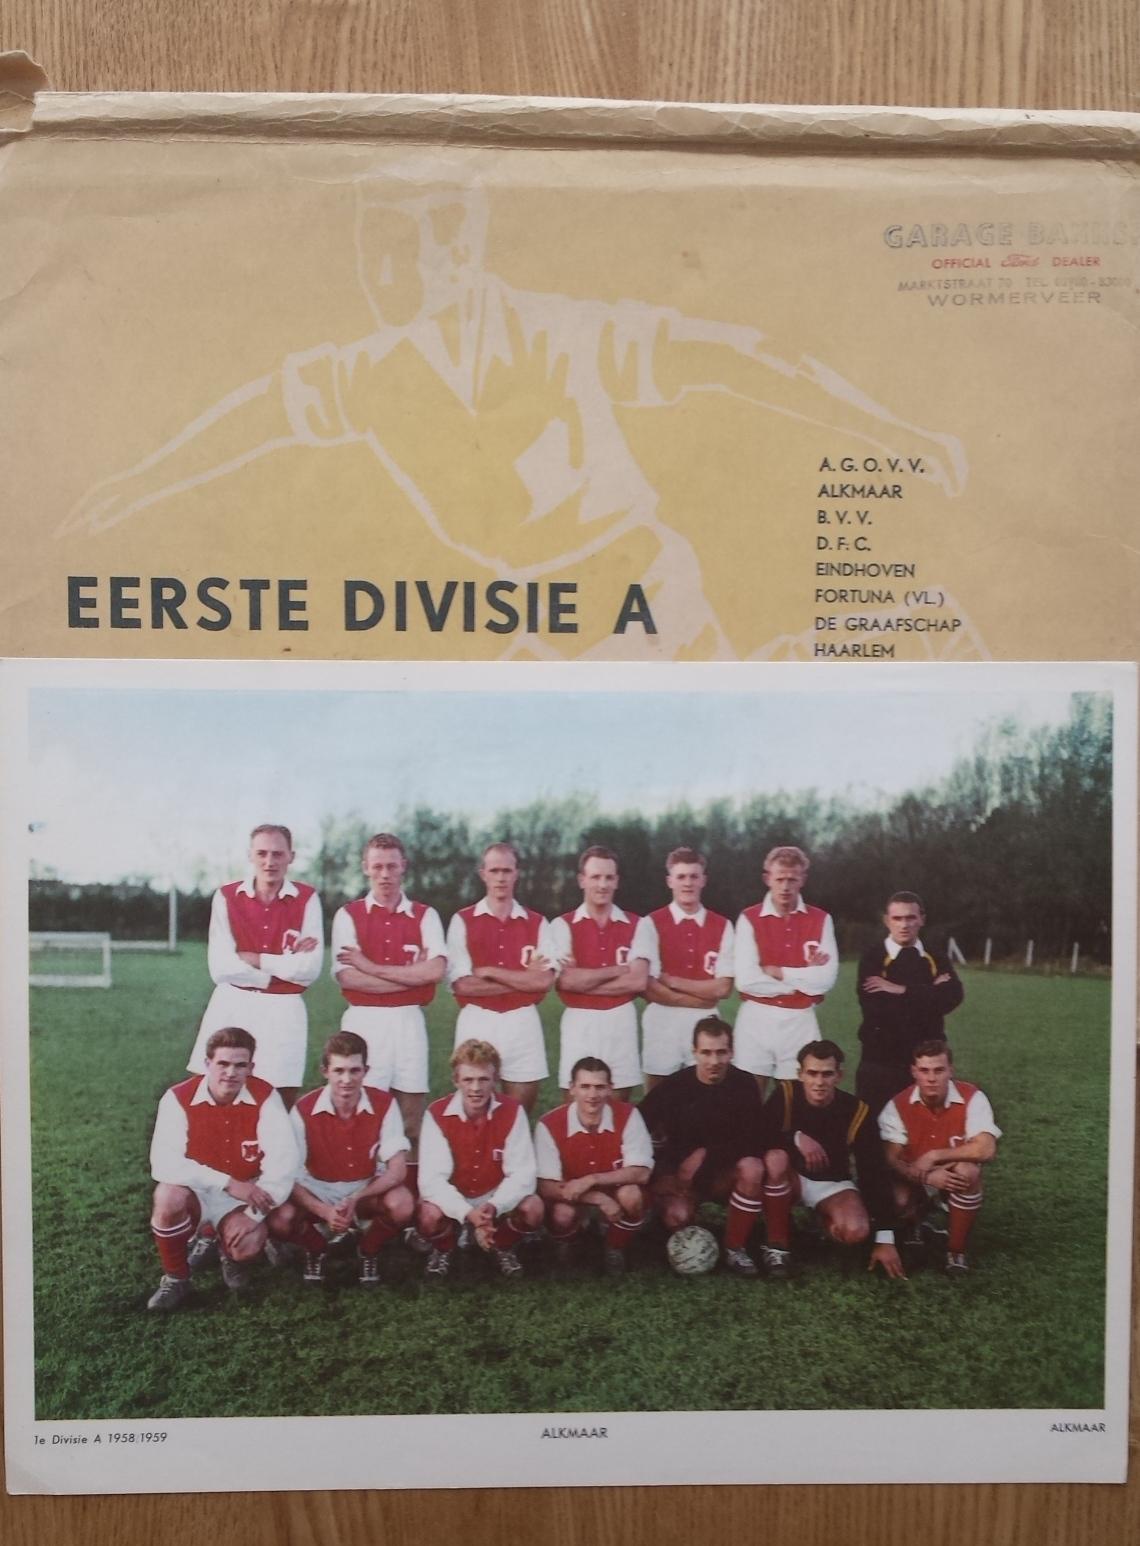 - Esso voetbalplaten 1958-1959 Eerste Divisie A